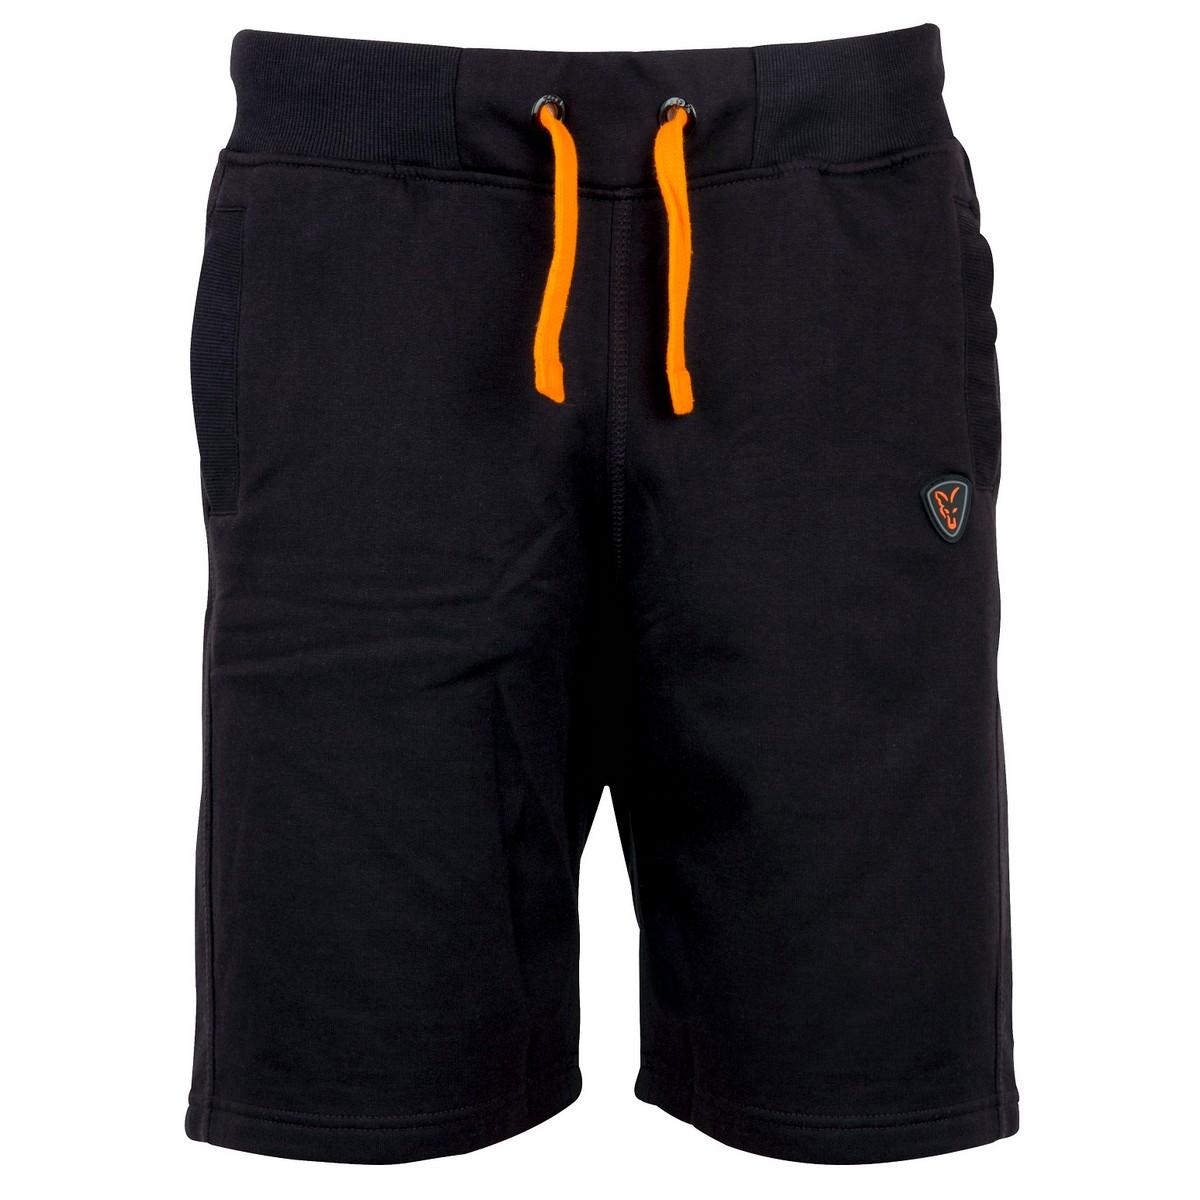 Къси панталони Fox Lightweight Jogger Shorts Black/Orange